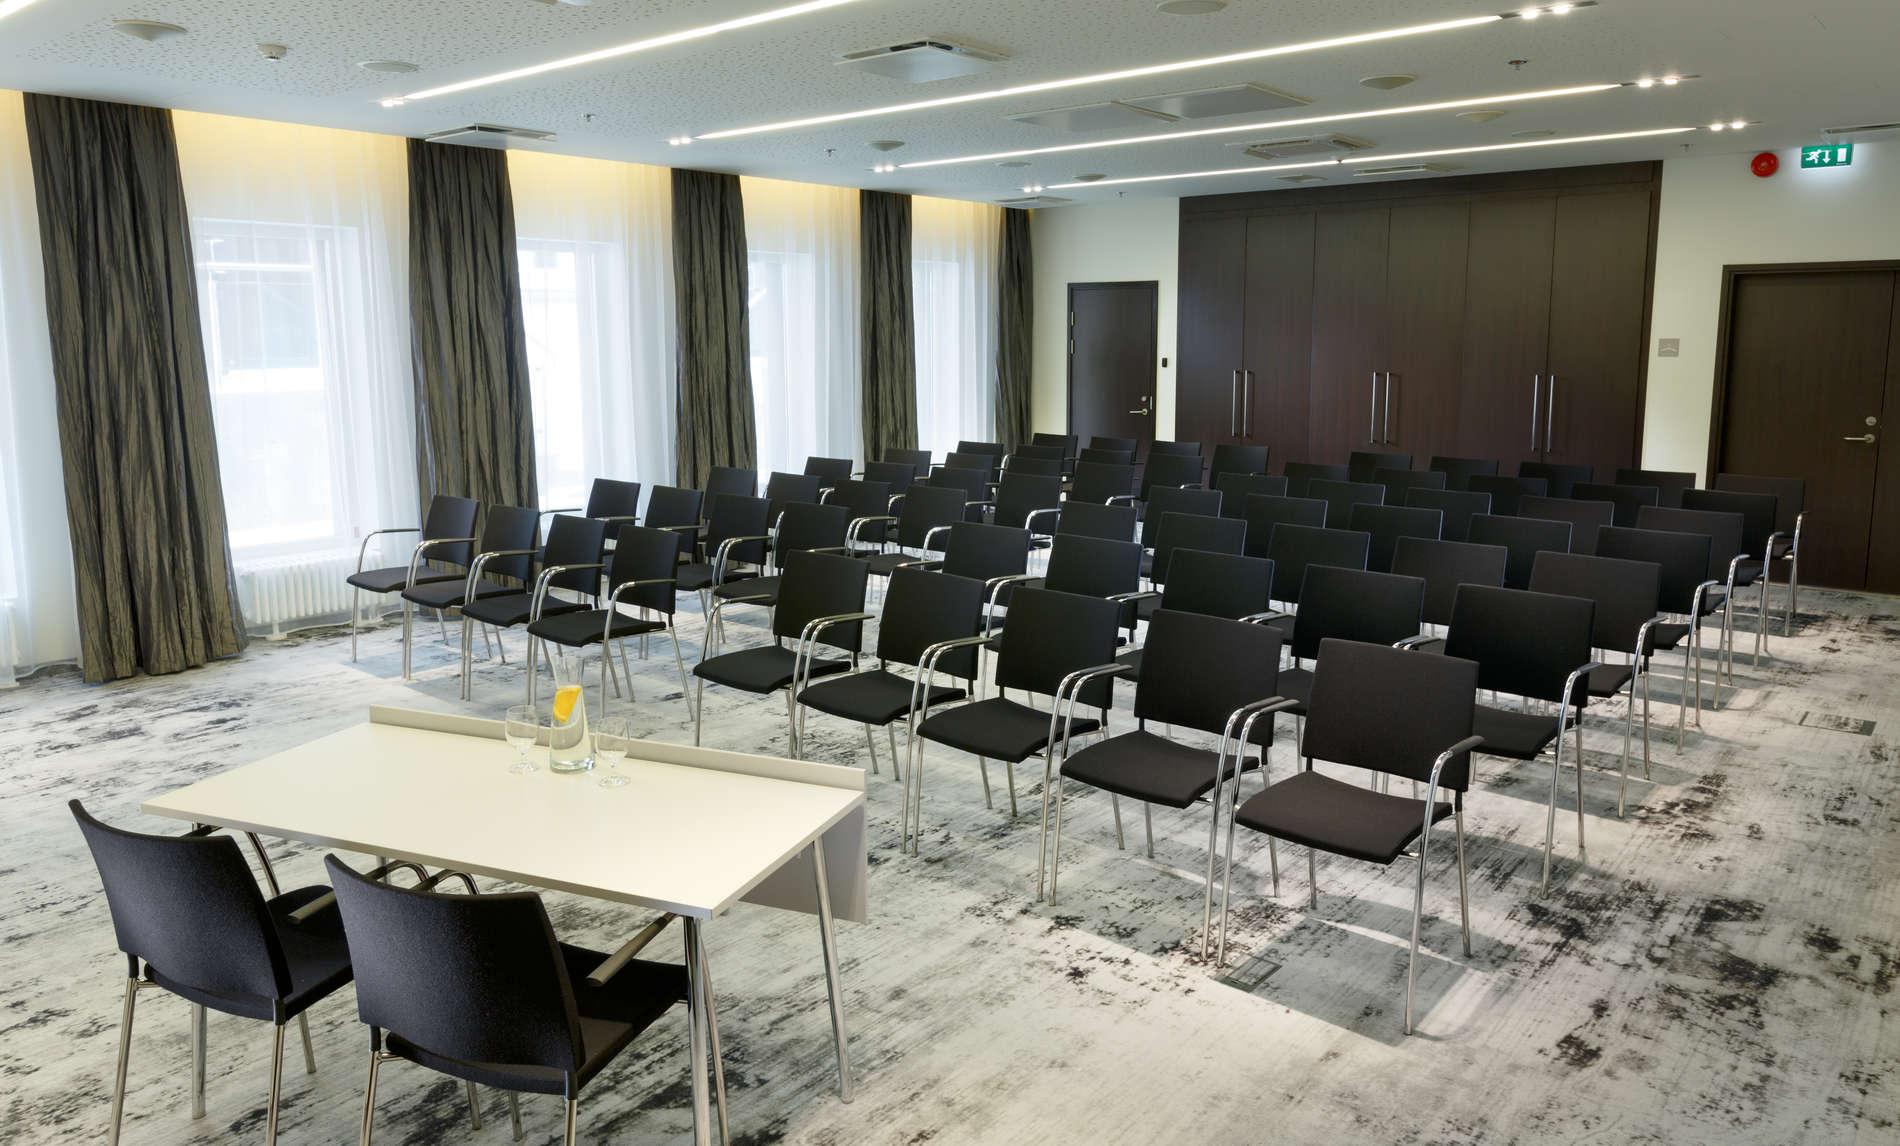 Hotel Palace - konverentsiruum